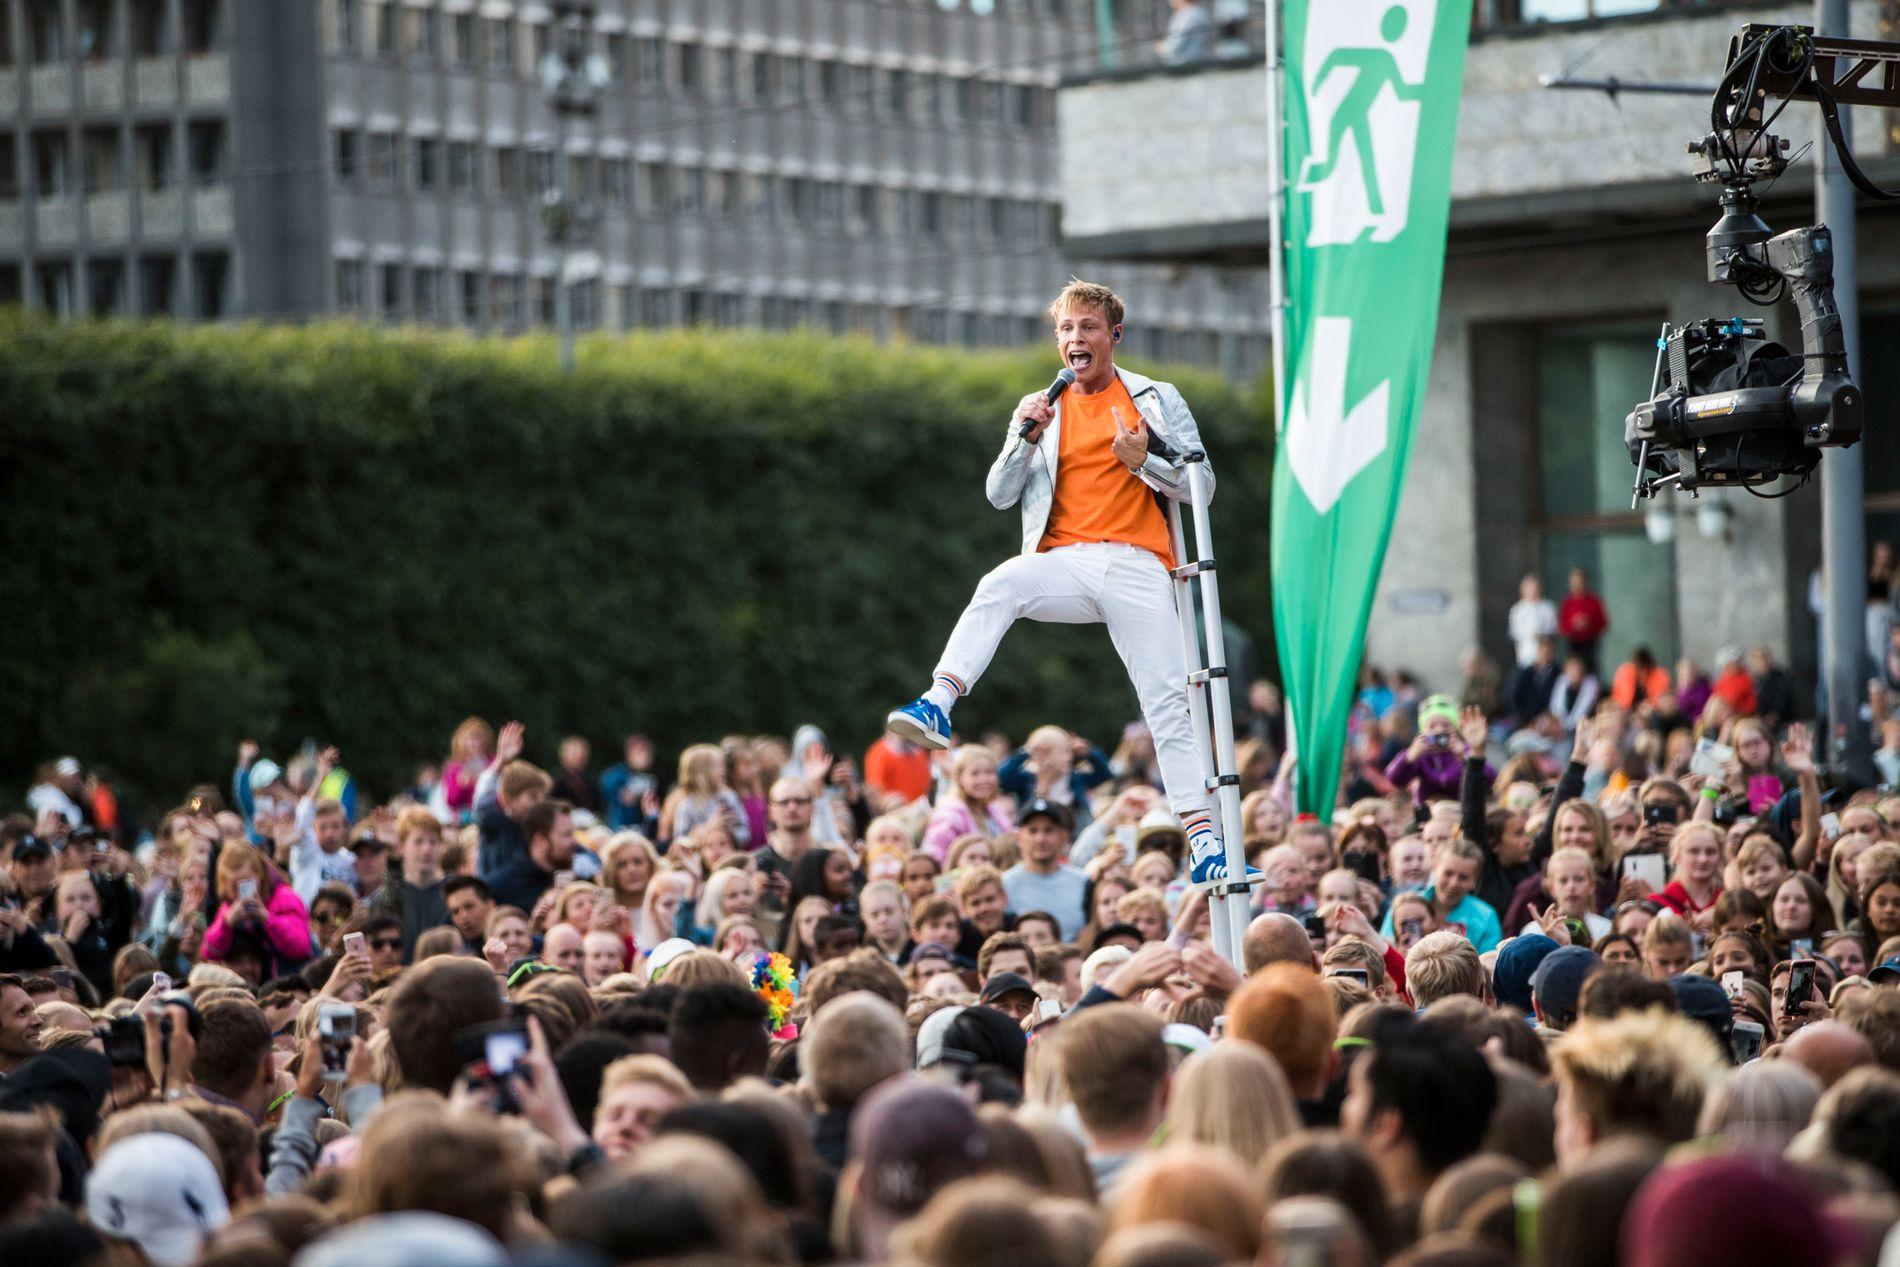 STIGE-STUNT: Sondre Justad i stigen under VG-lista-konserten på Rådhusplassen i Oslo i juni. Under en festivalopptreden på Giske lørdag, endte stige-stuntet i en Justad full av blåmerker.